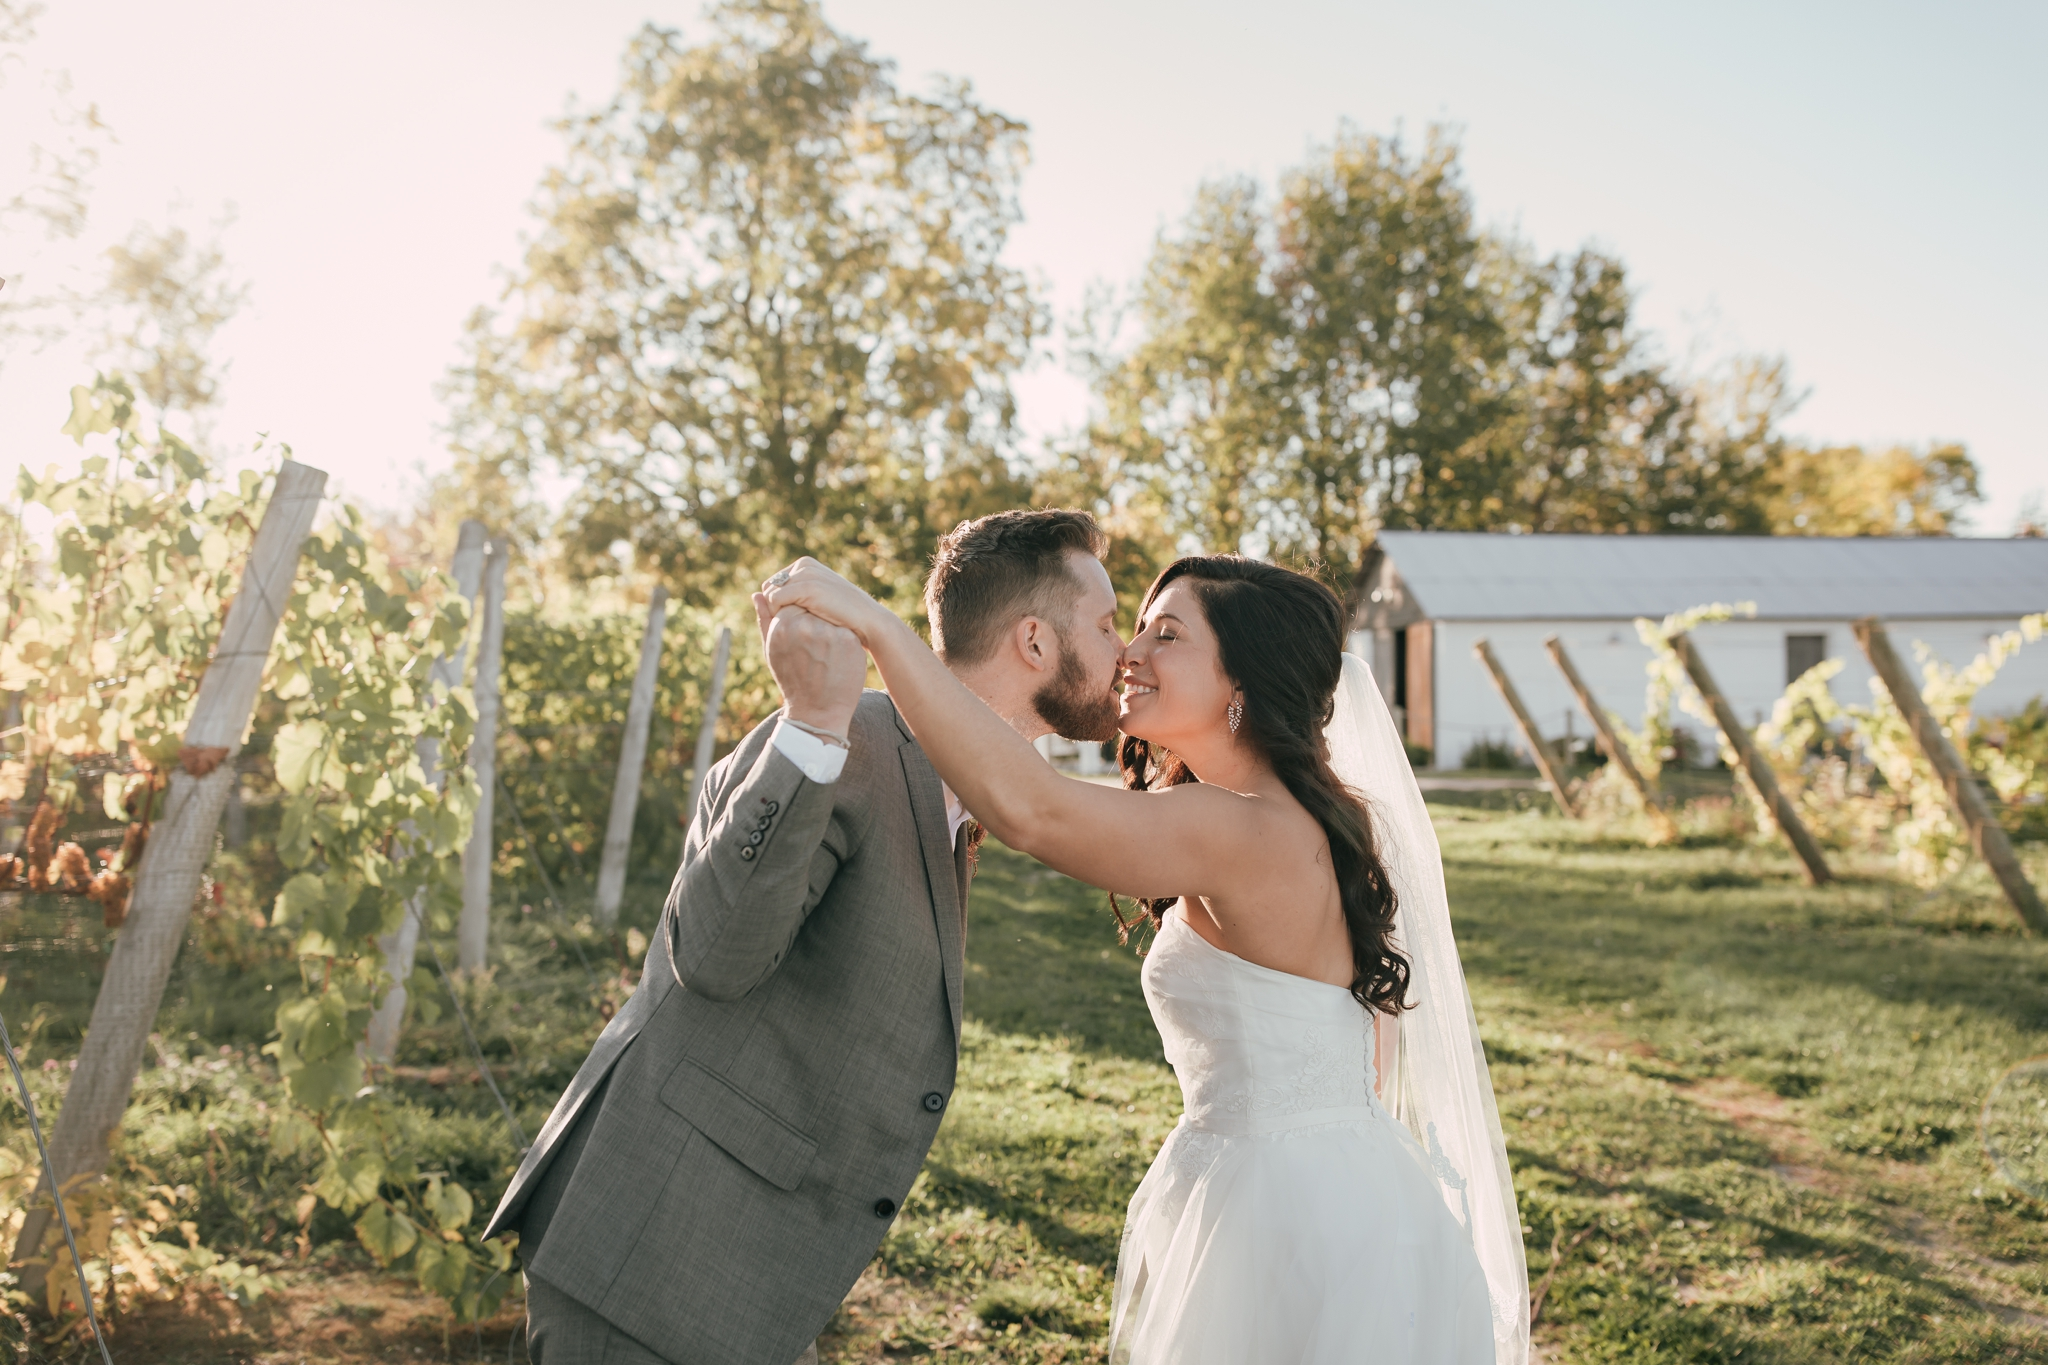 Heather-Nash-Photography-Aurora-Cellars-Wedding-Leelanau-Peninsula-Michigan_0147.jpg